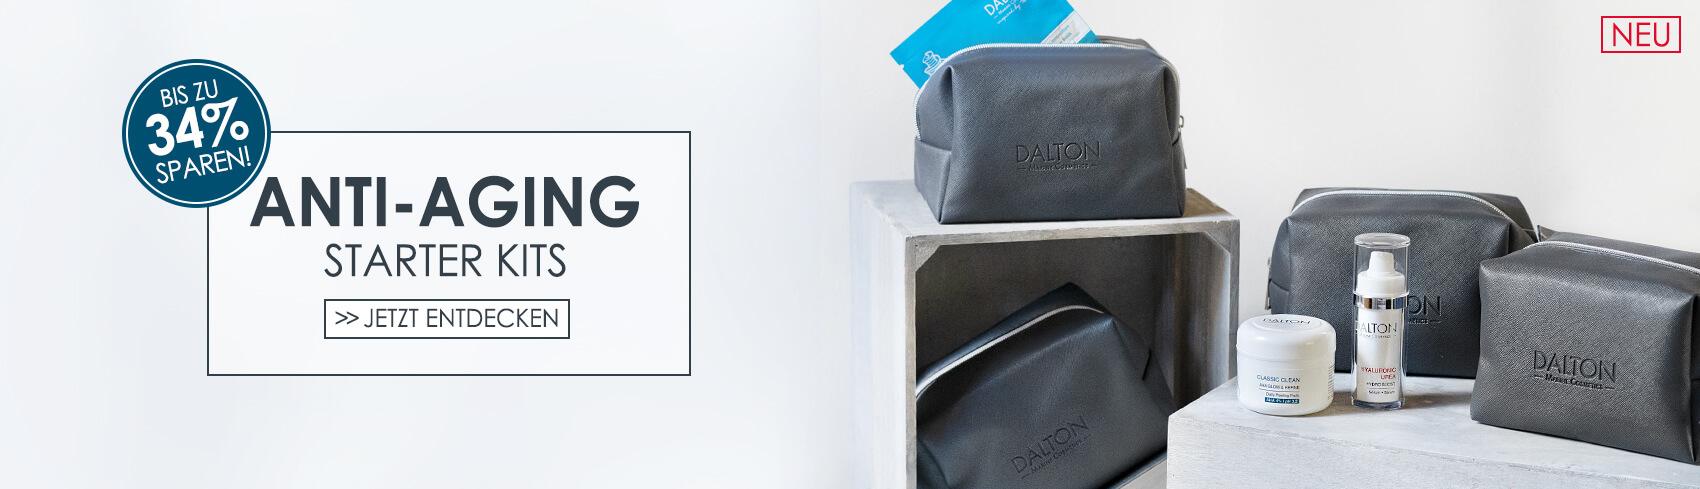 Dalton Anti-Aging Kits